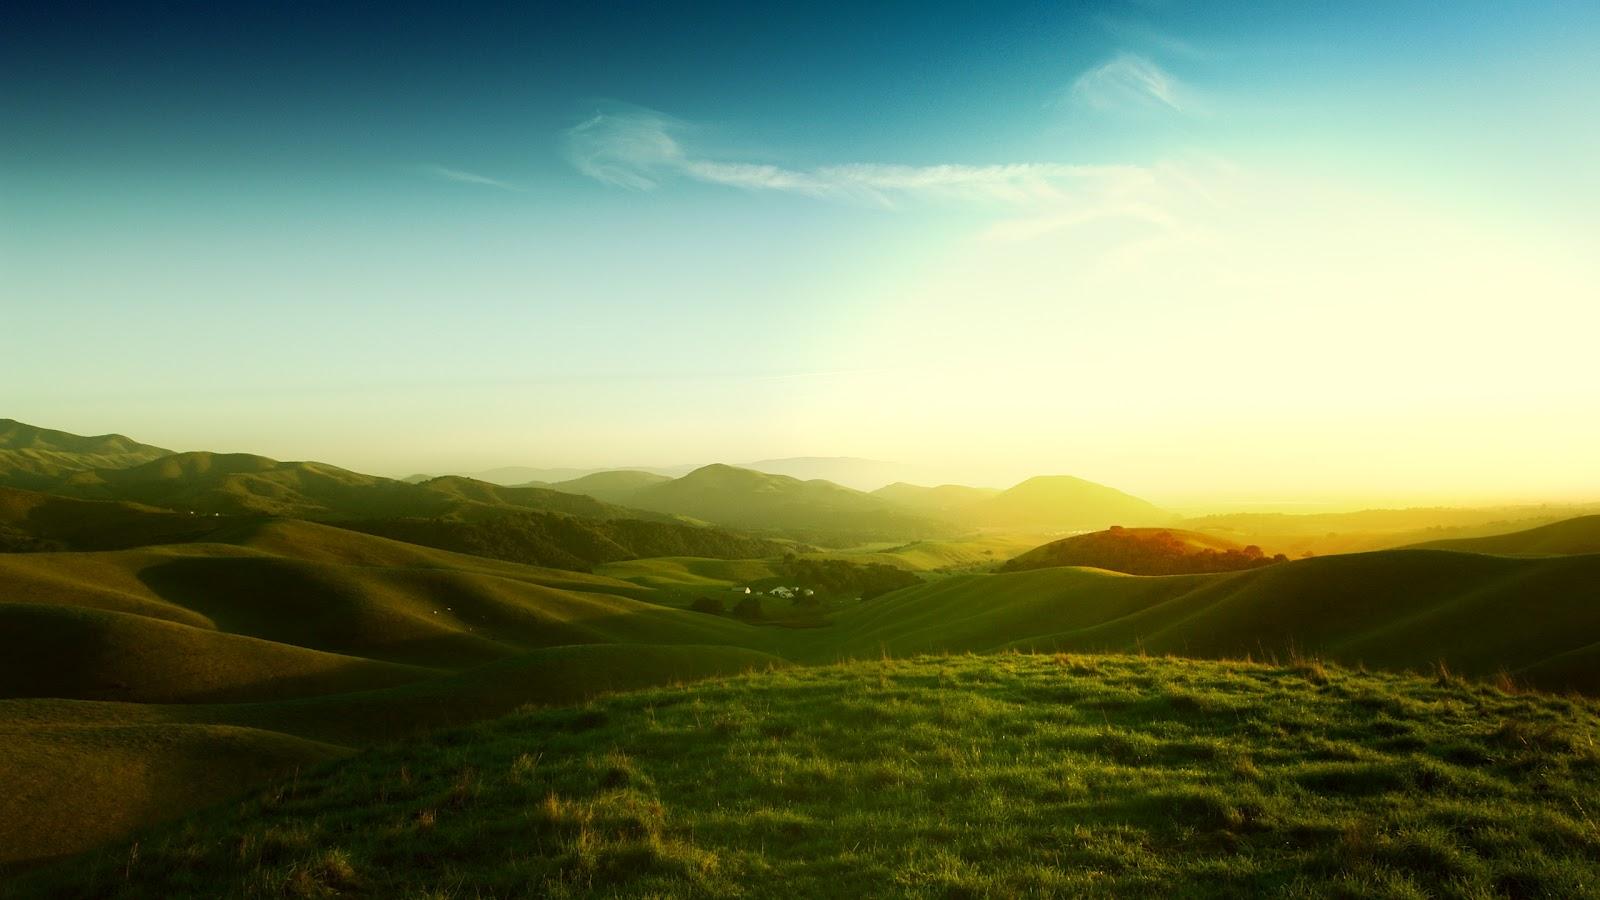 Peaceful Landscapes | Landscape Wallpaper